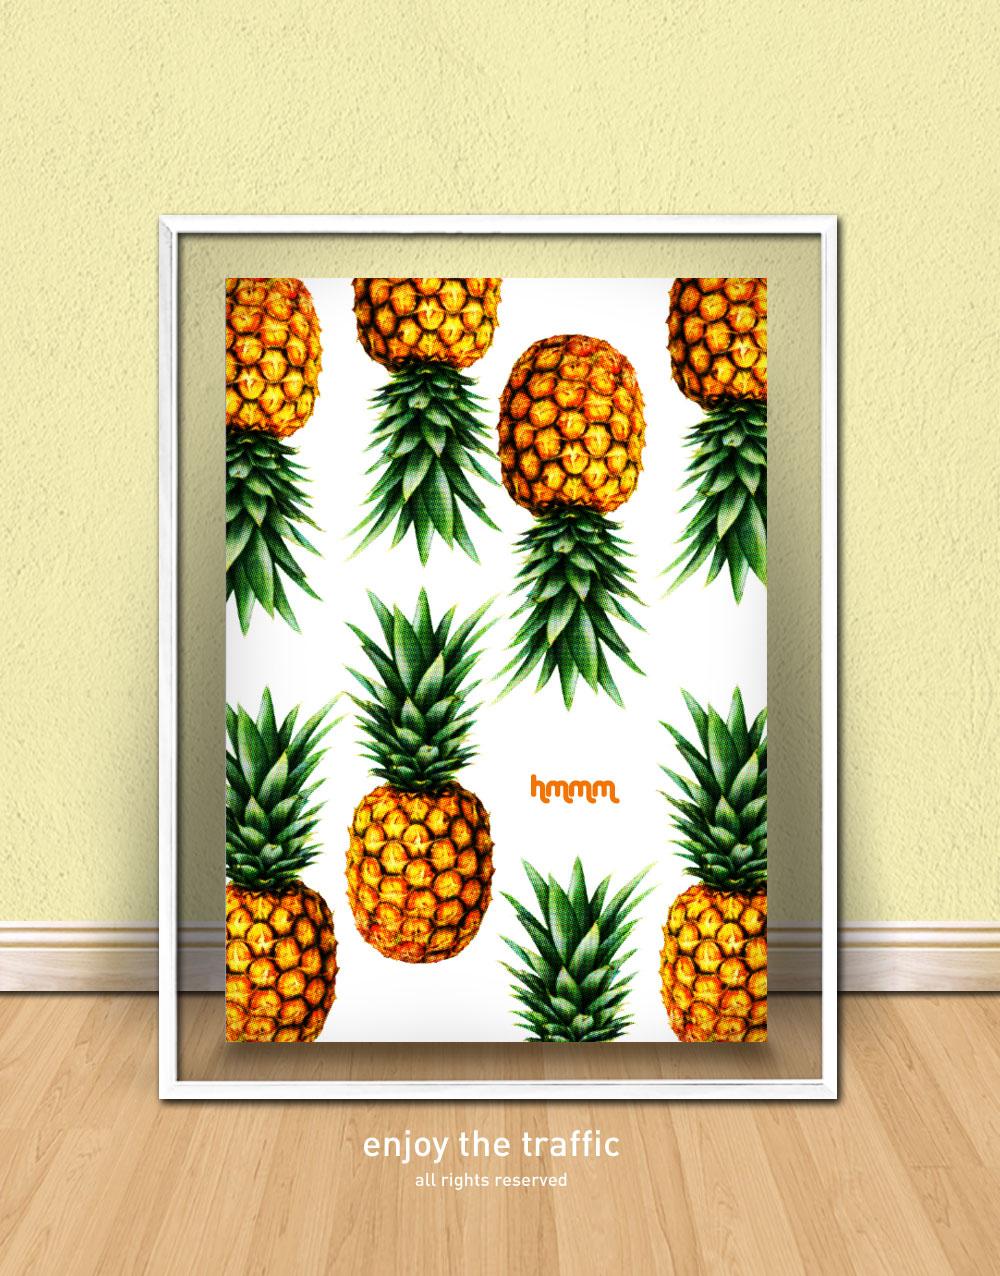 Posters Decorativos Poster Le Ballon B Vinilos Decorativos  ~ Imagens Para Quadros De Quarto Para Imprimir Abacaxi